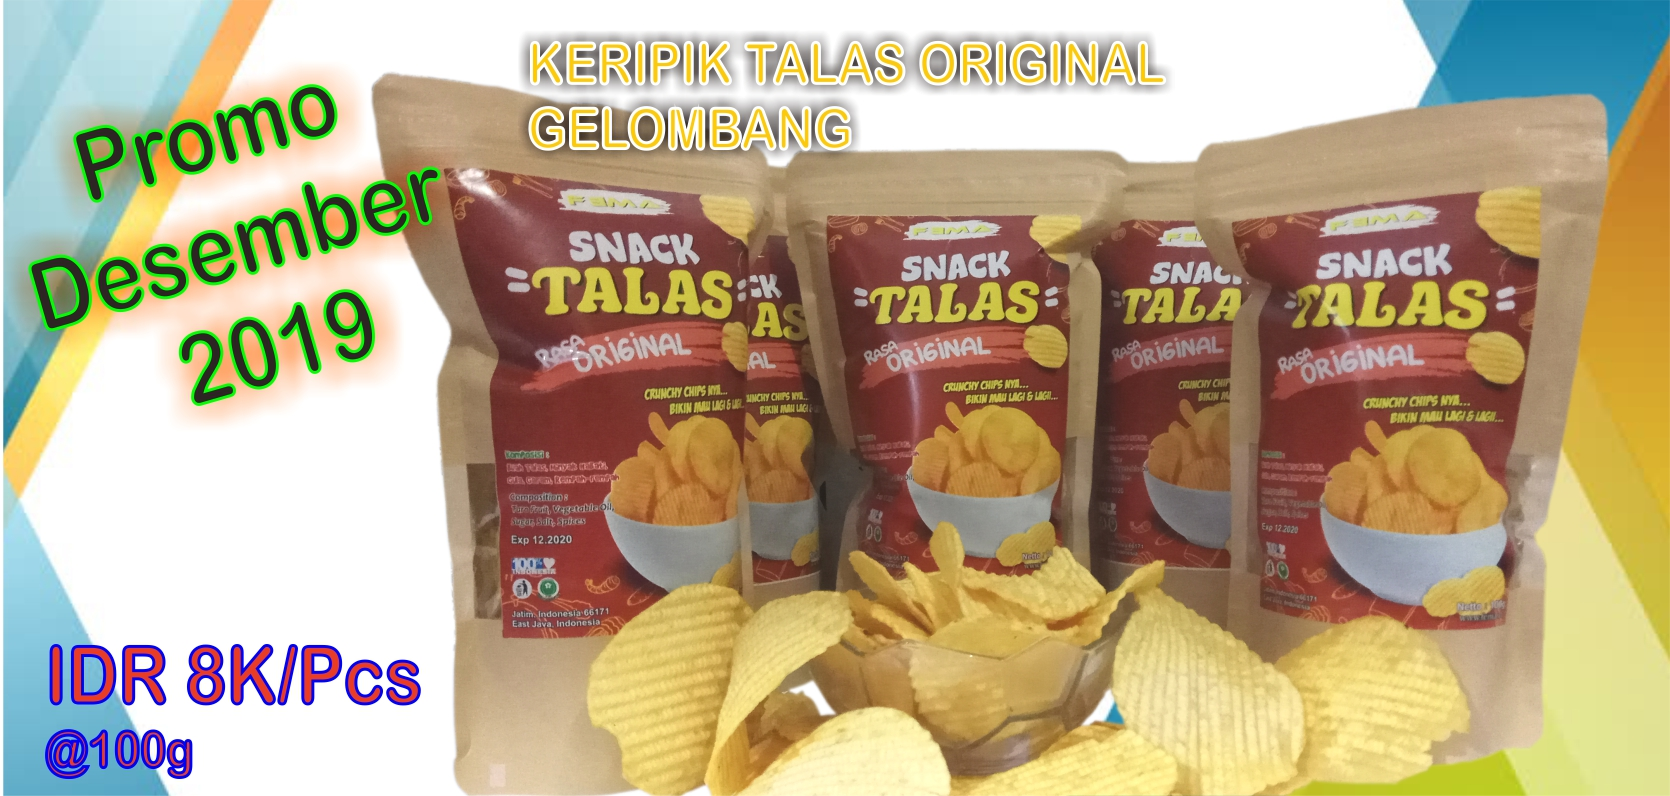 Keripik Talas Original